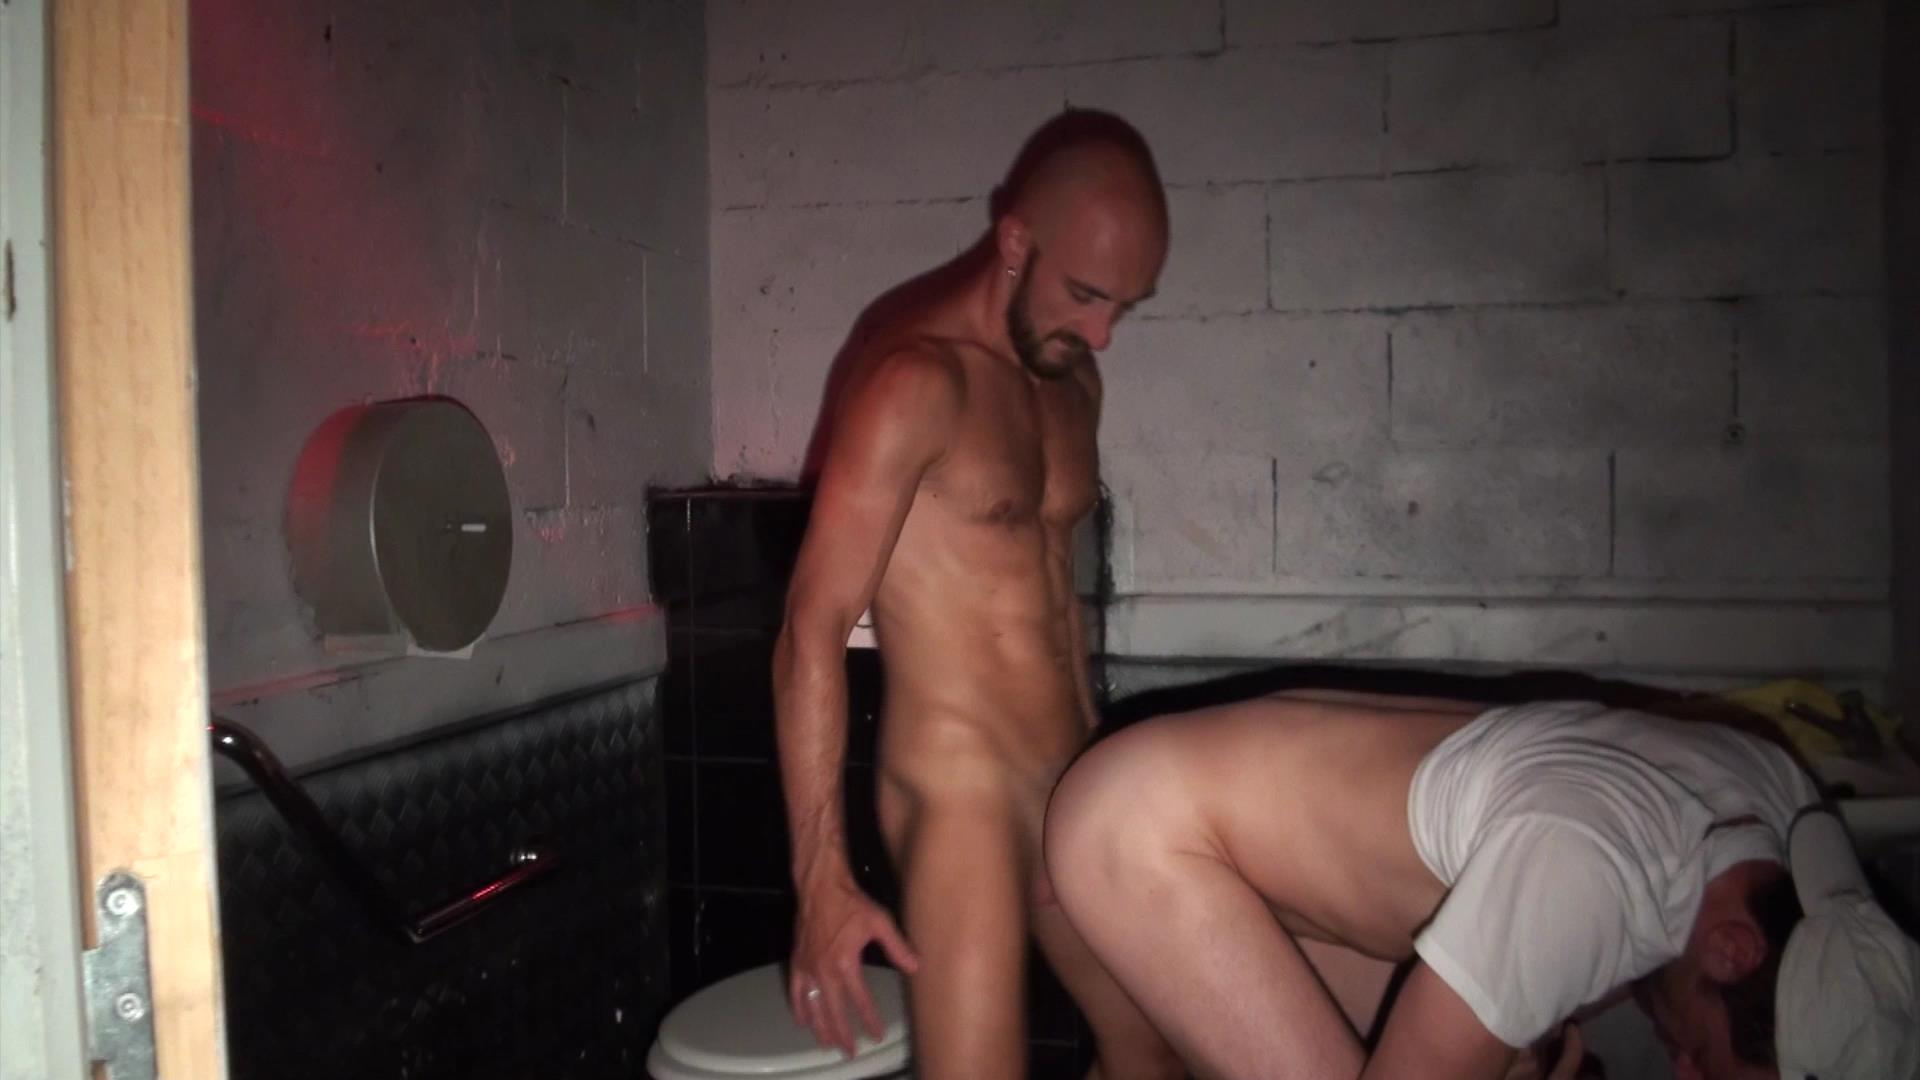 Гей Порно Видео В Туалете